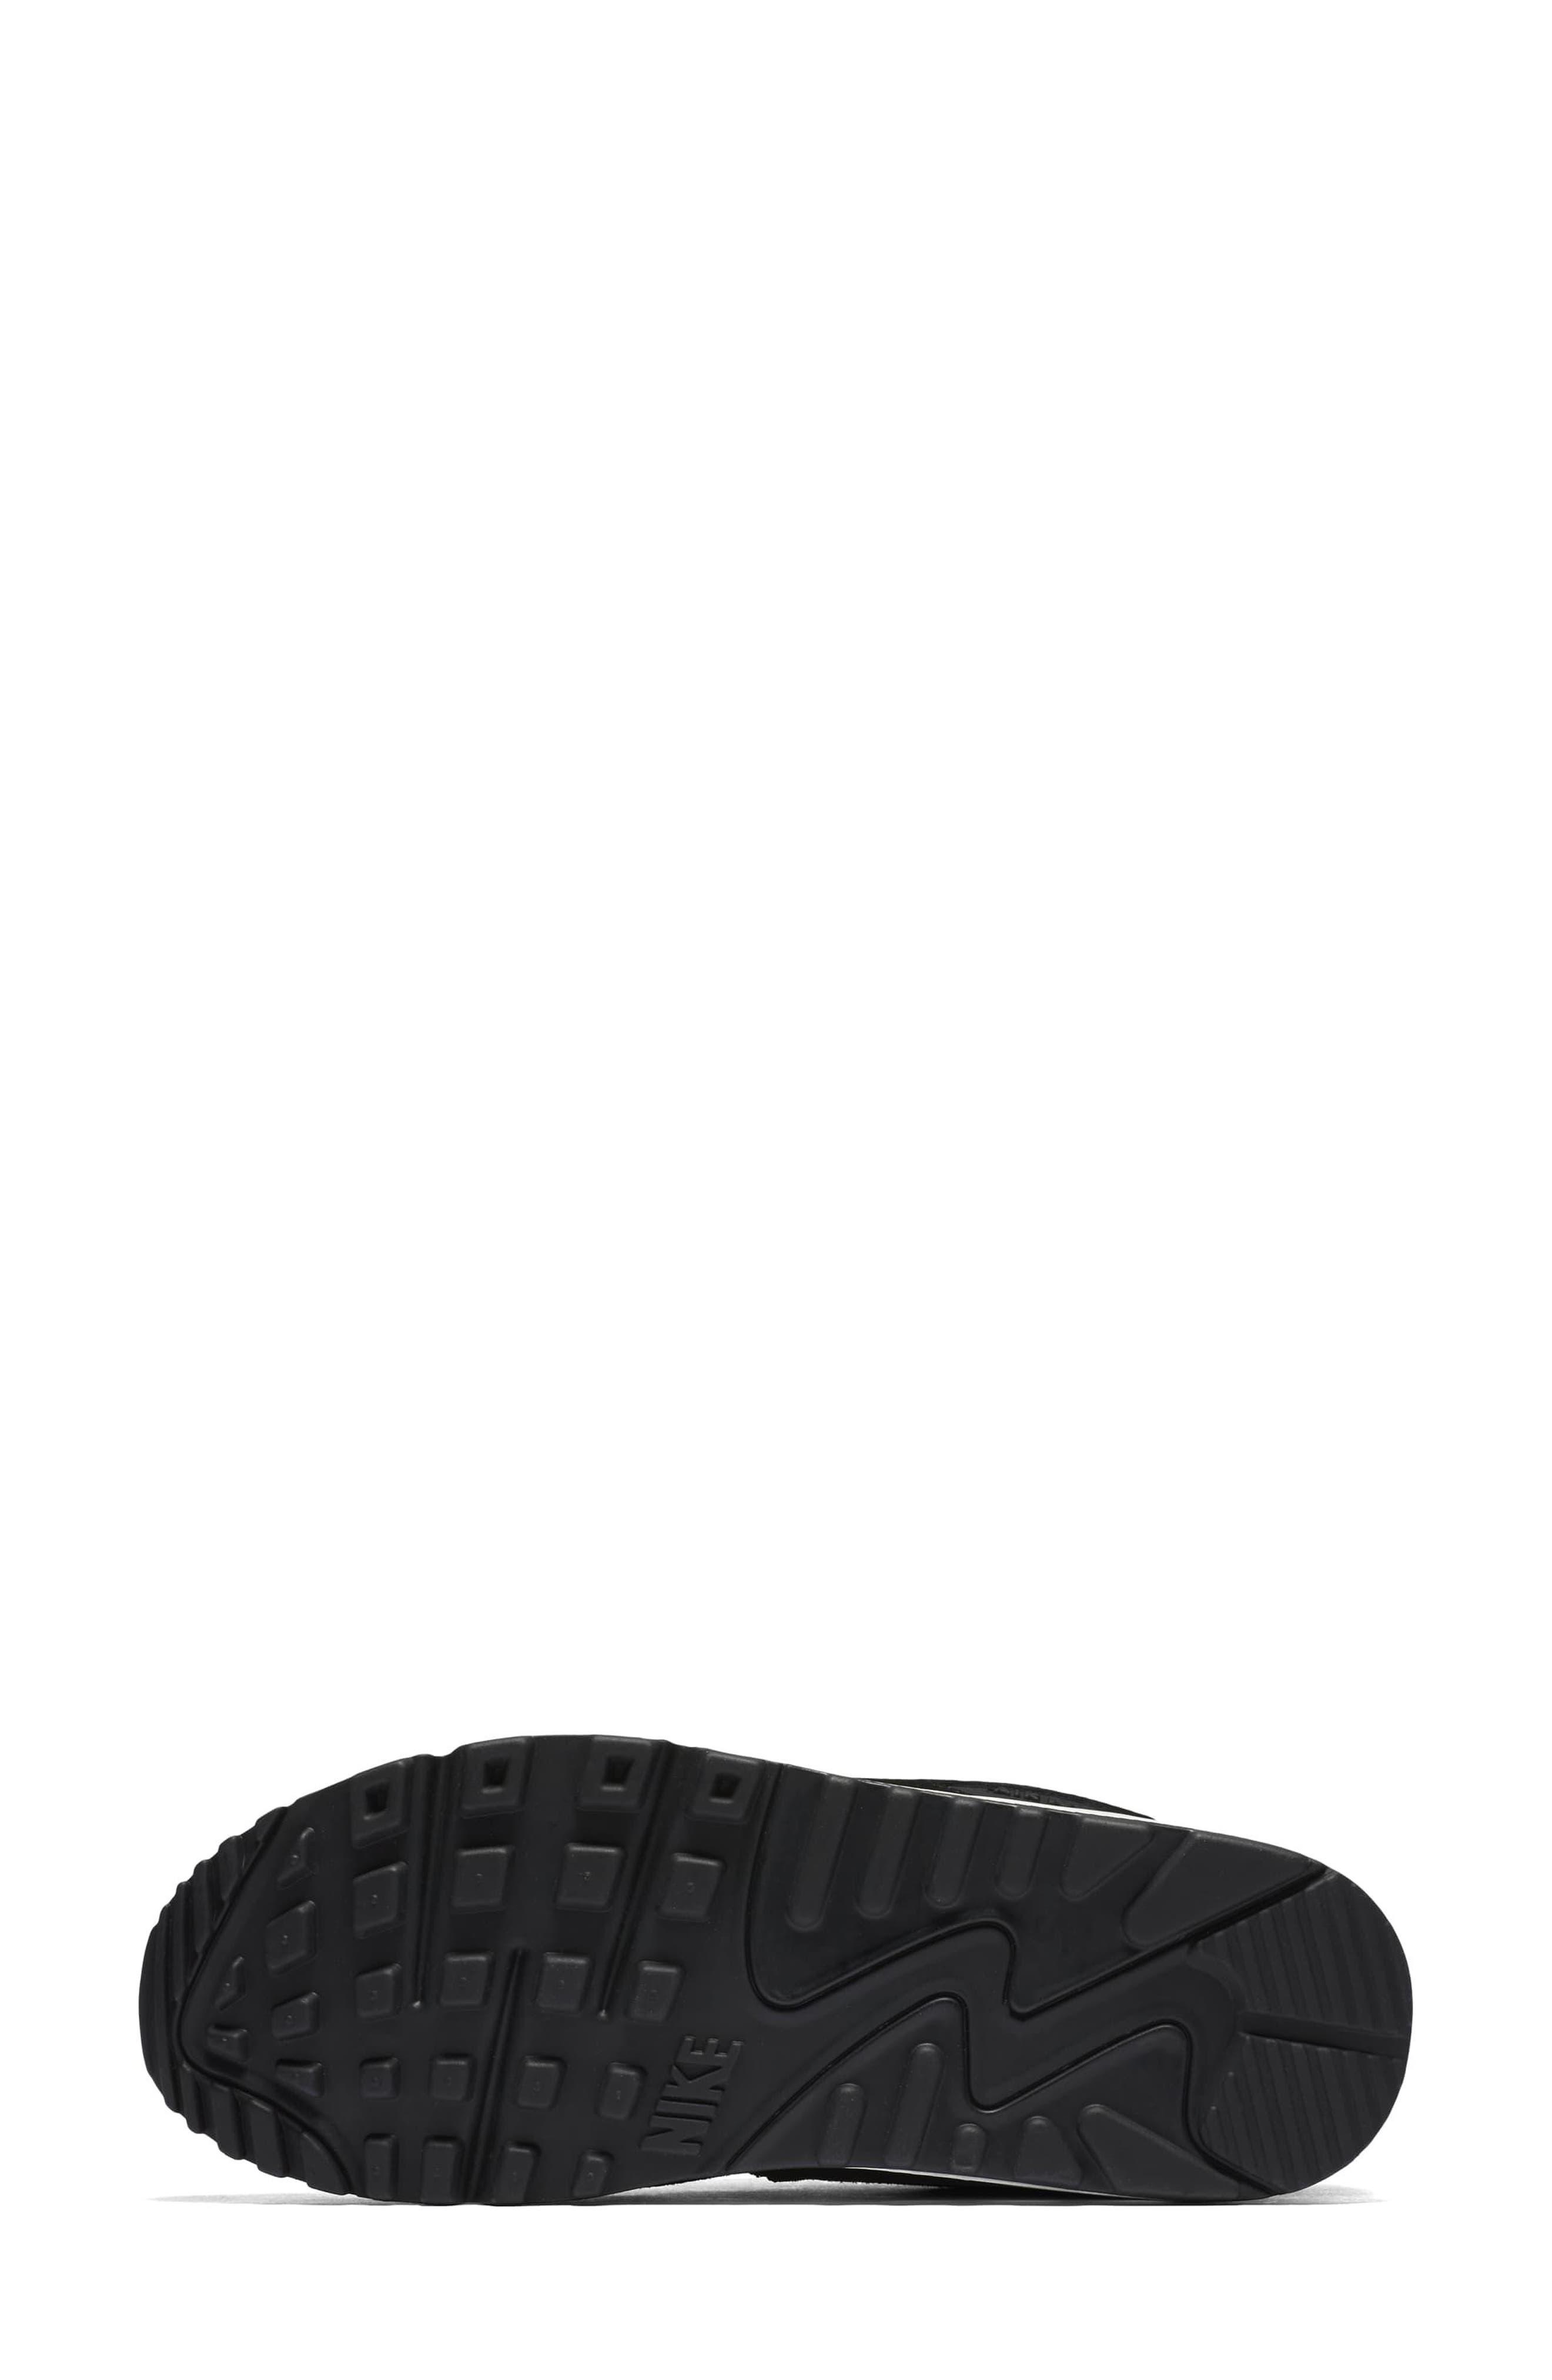 Air Max 90 SE Sneaker,                             Alternate thumbnail 40, color,